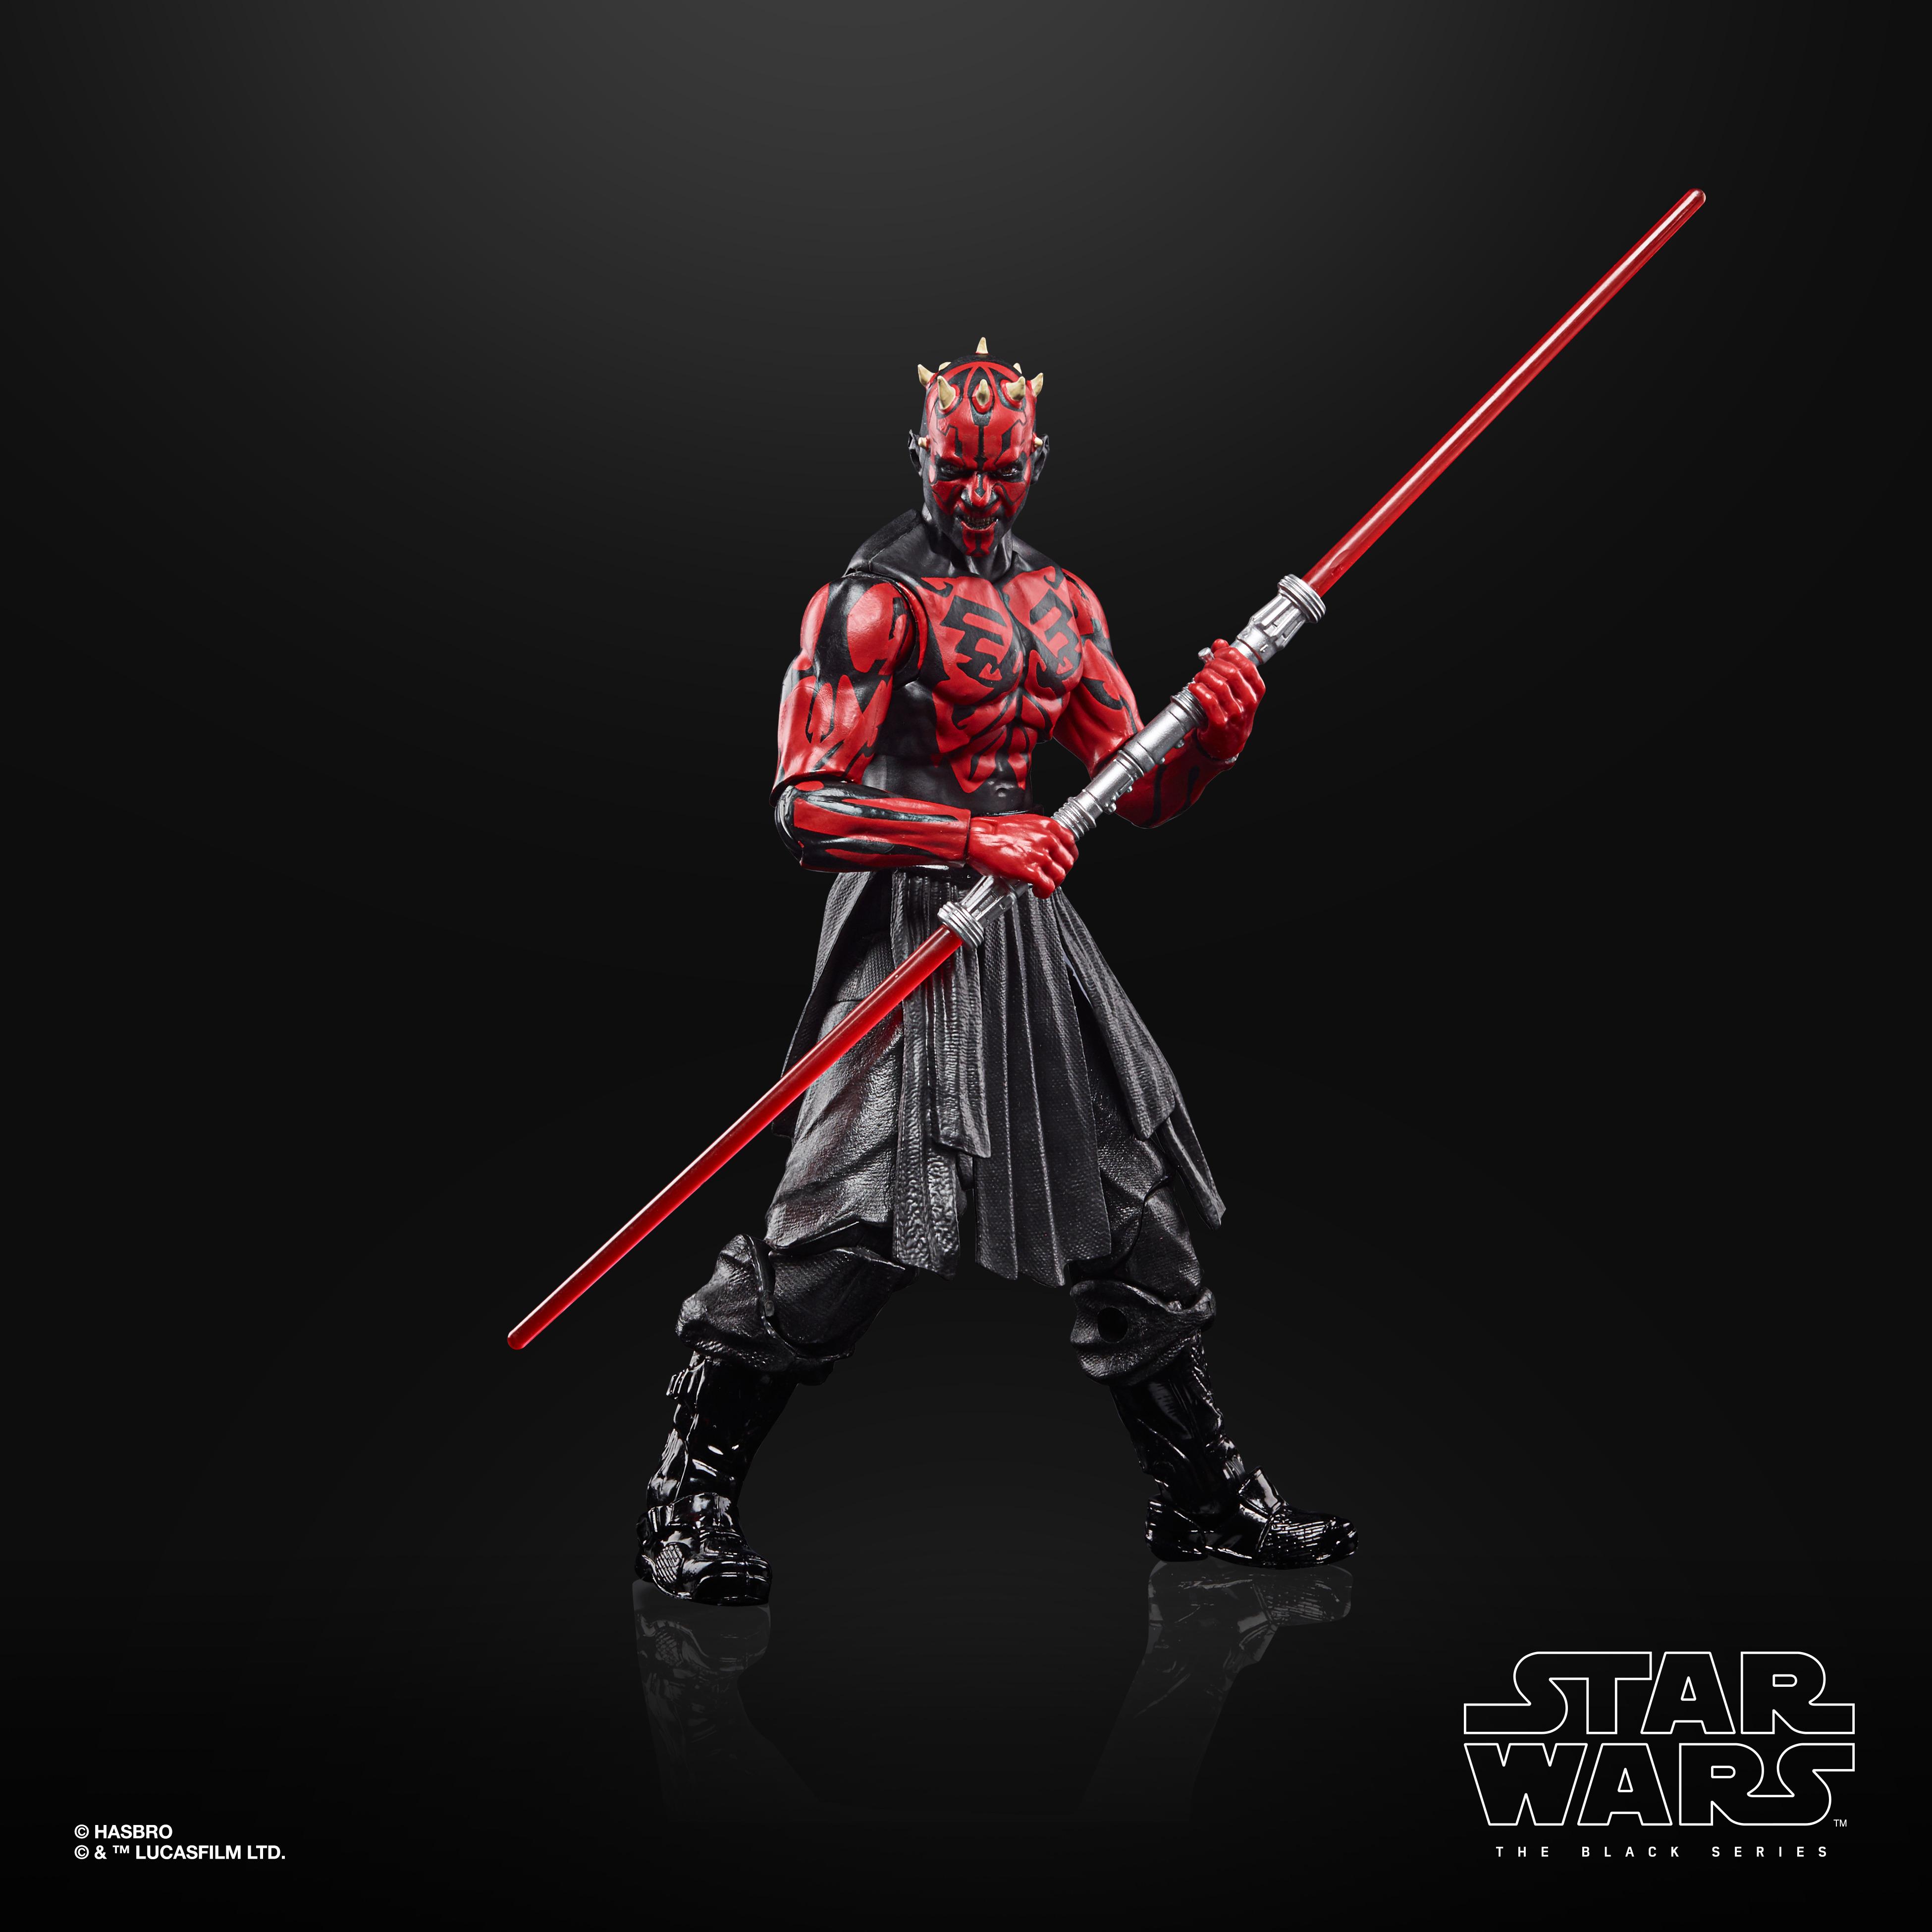 Star Wars The Black Series Darth Maul (Sith Apprentice) LUCASFILM 50TH ANNIVERSARY FIGURE F28145L0 5010993867288